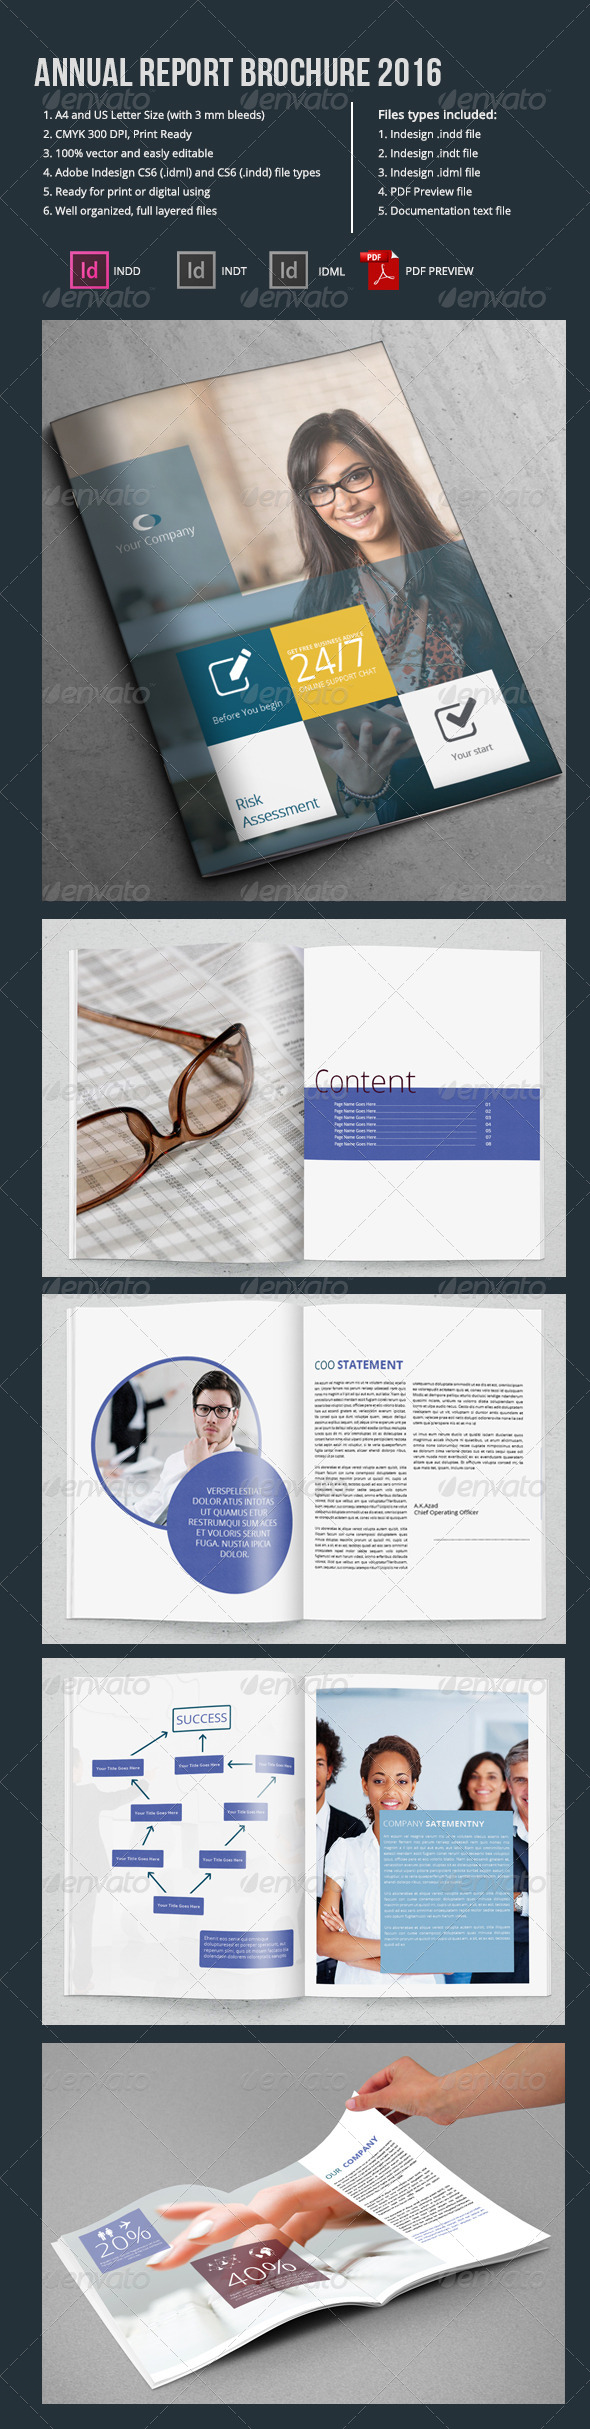 Annual Report Brochure 2016 - Portfolio Brochures